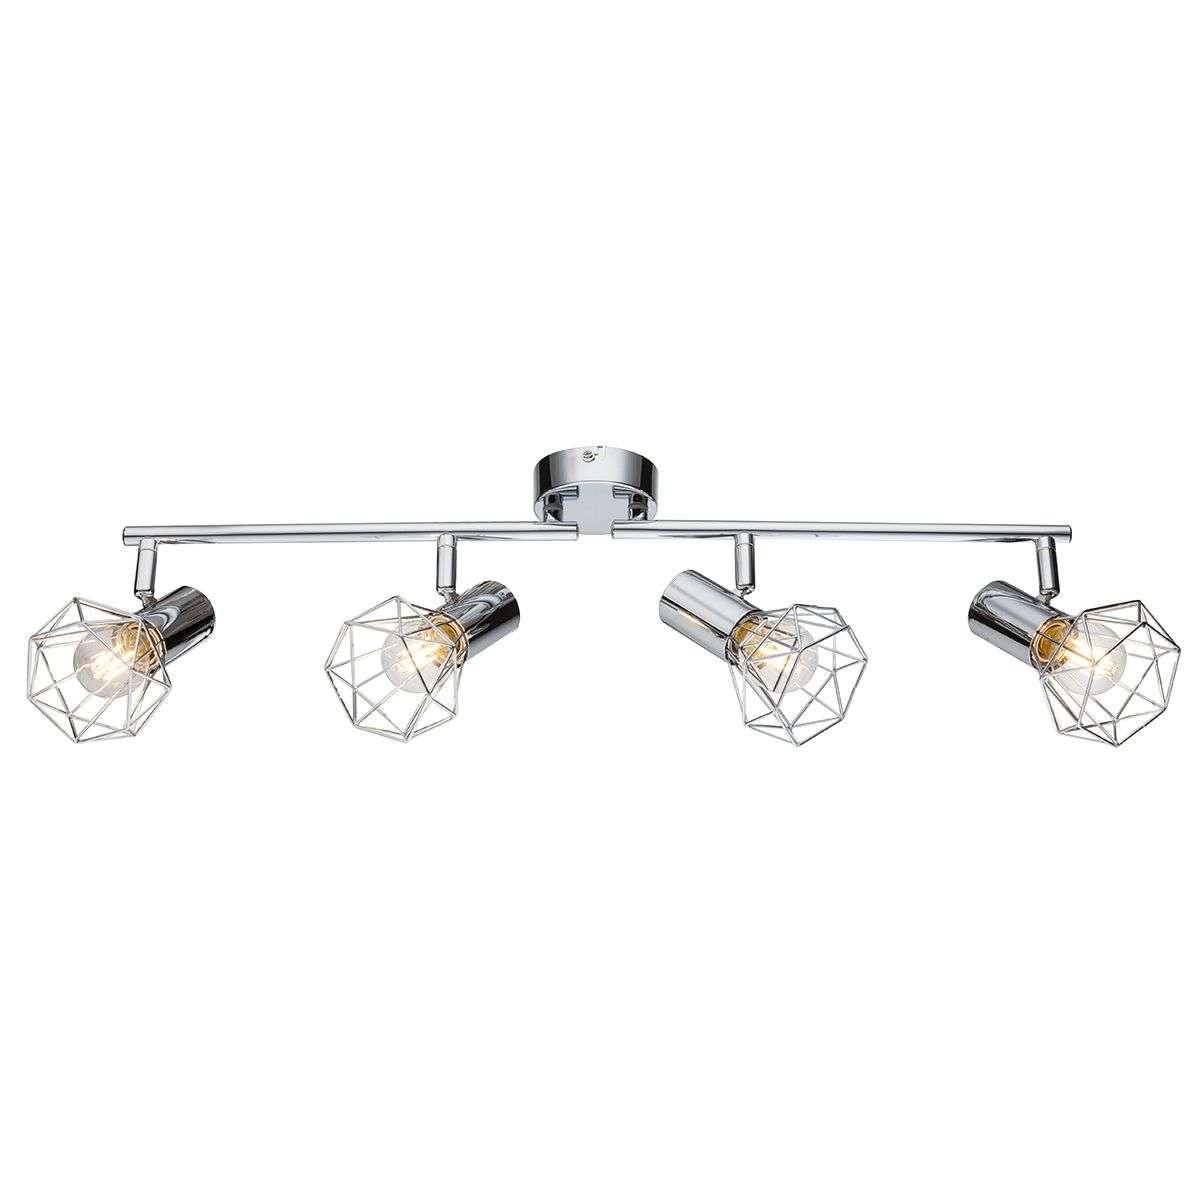 Moving spotlights 4 bulb ceiling light daiva lights moving spotlights 4 bulb ceiling light daiva 4014894 31 aloadofball Choice Image